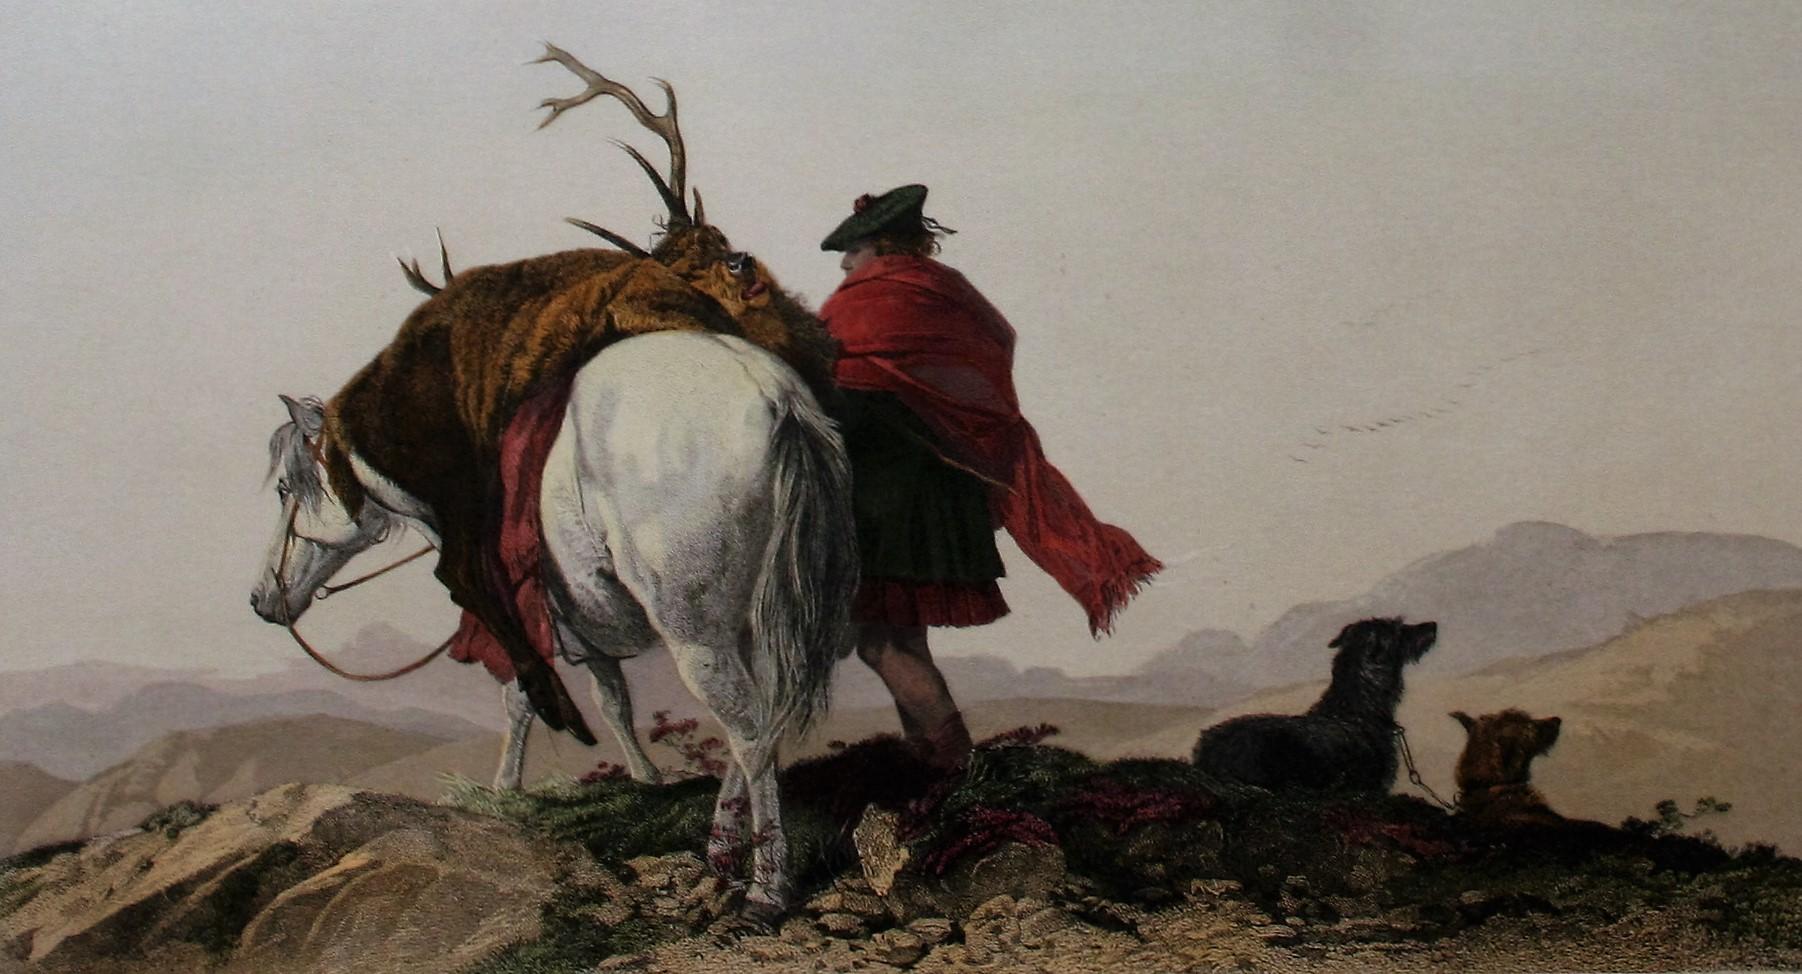 Richard Ansdell 1815 - 1885